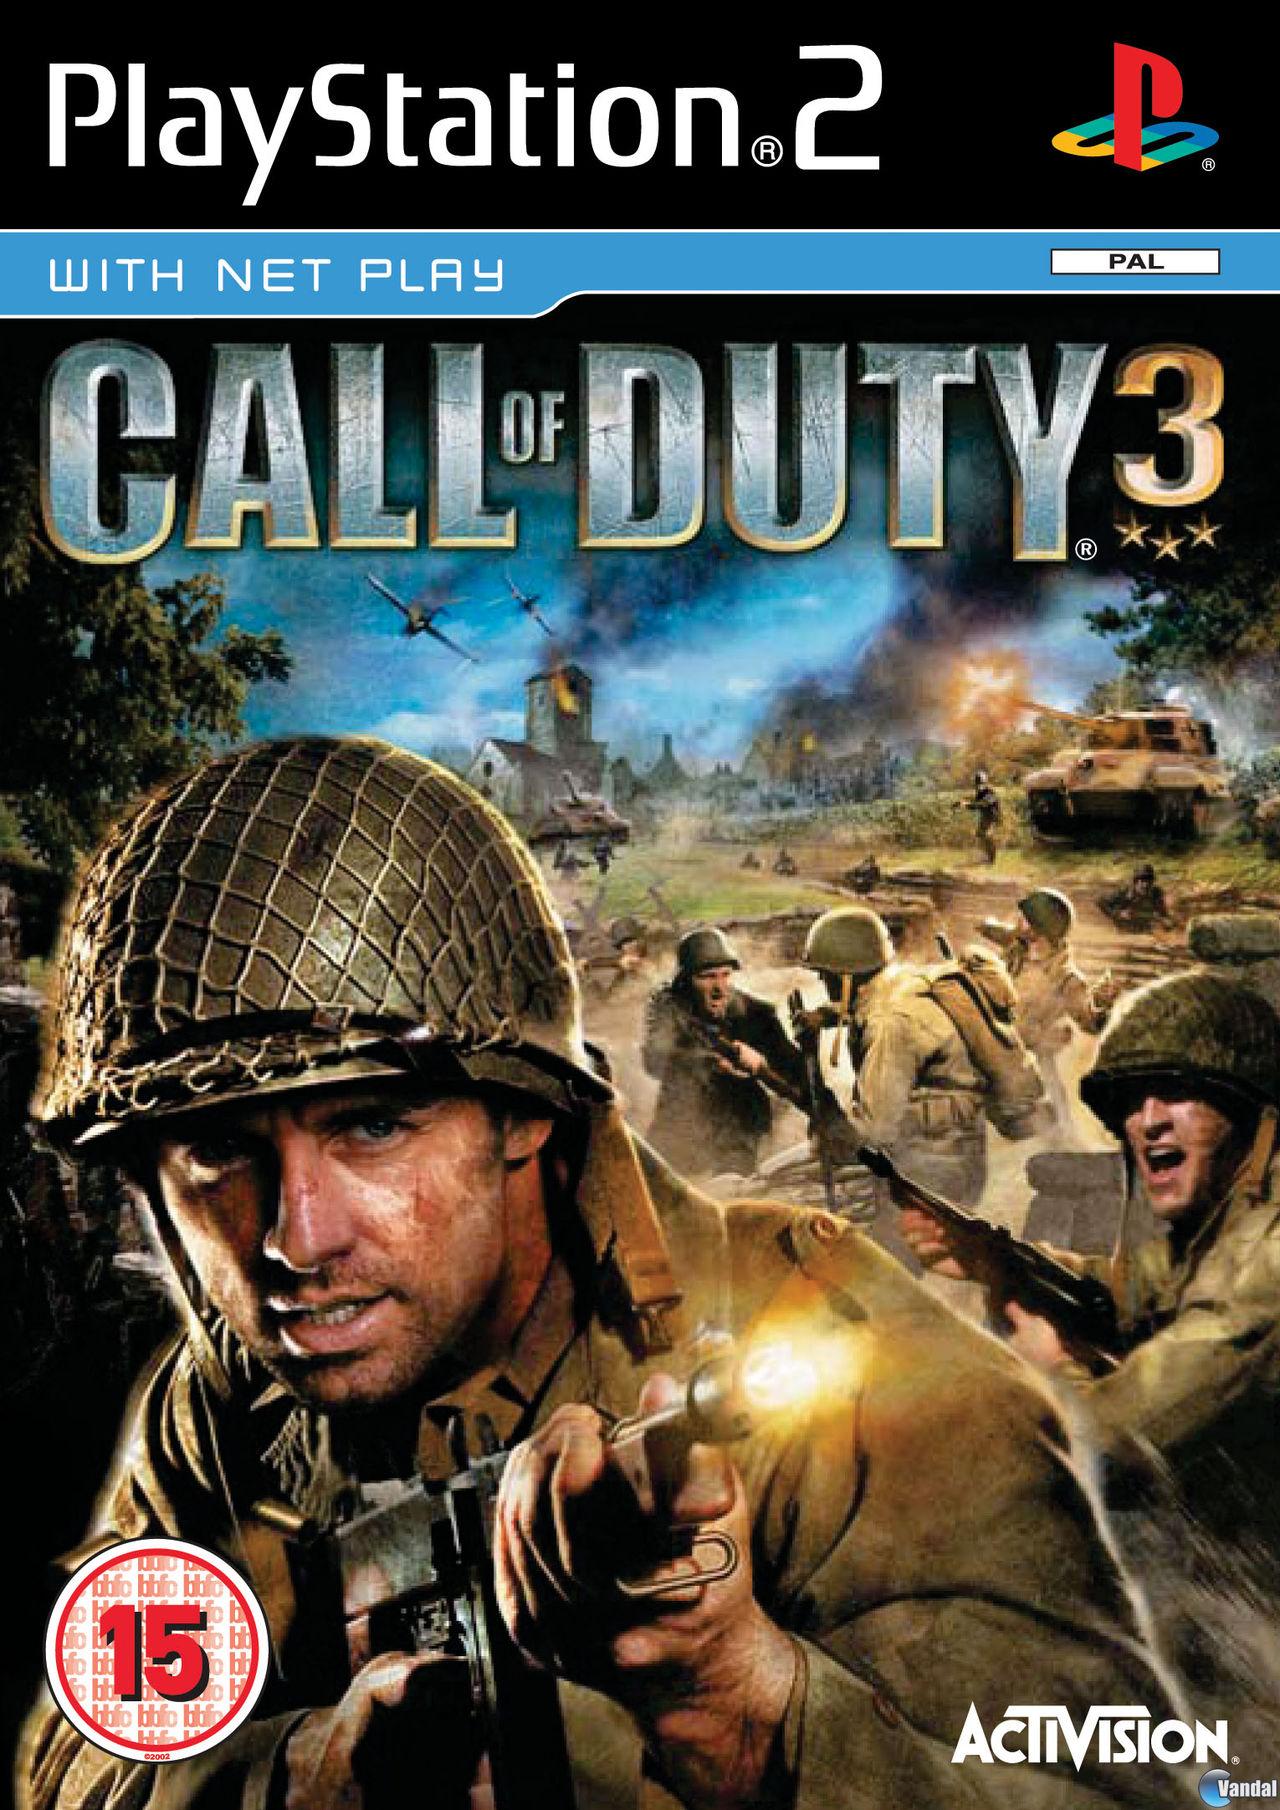 Imagen 18 de Call of Duty 3 para PlayStation 2